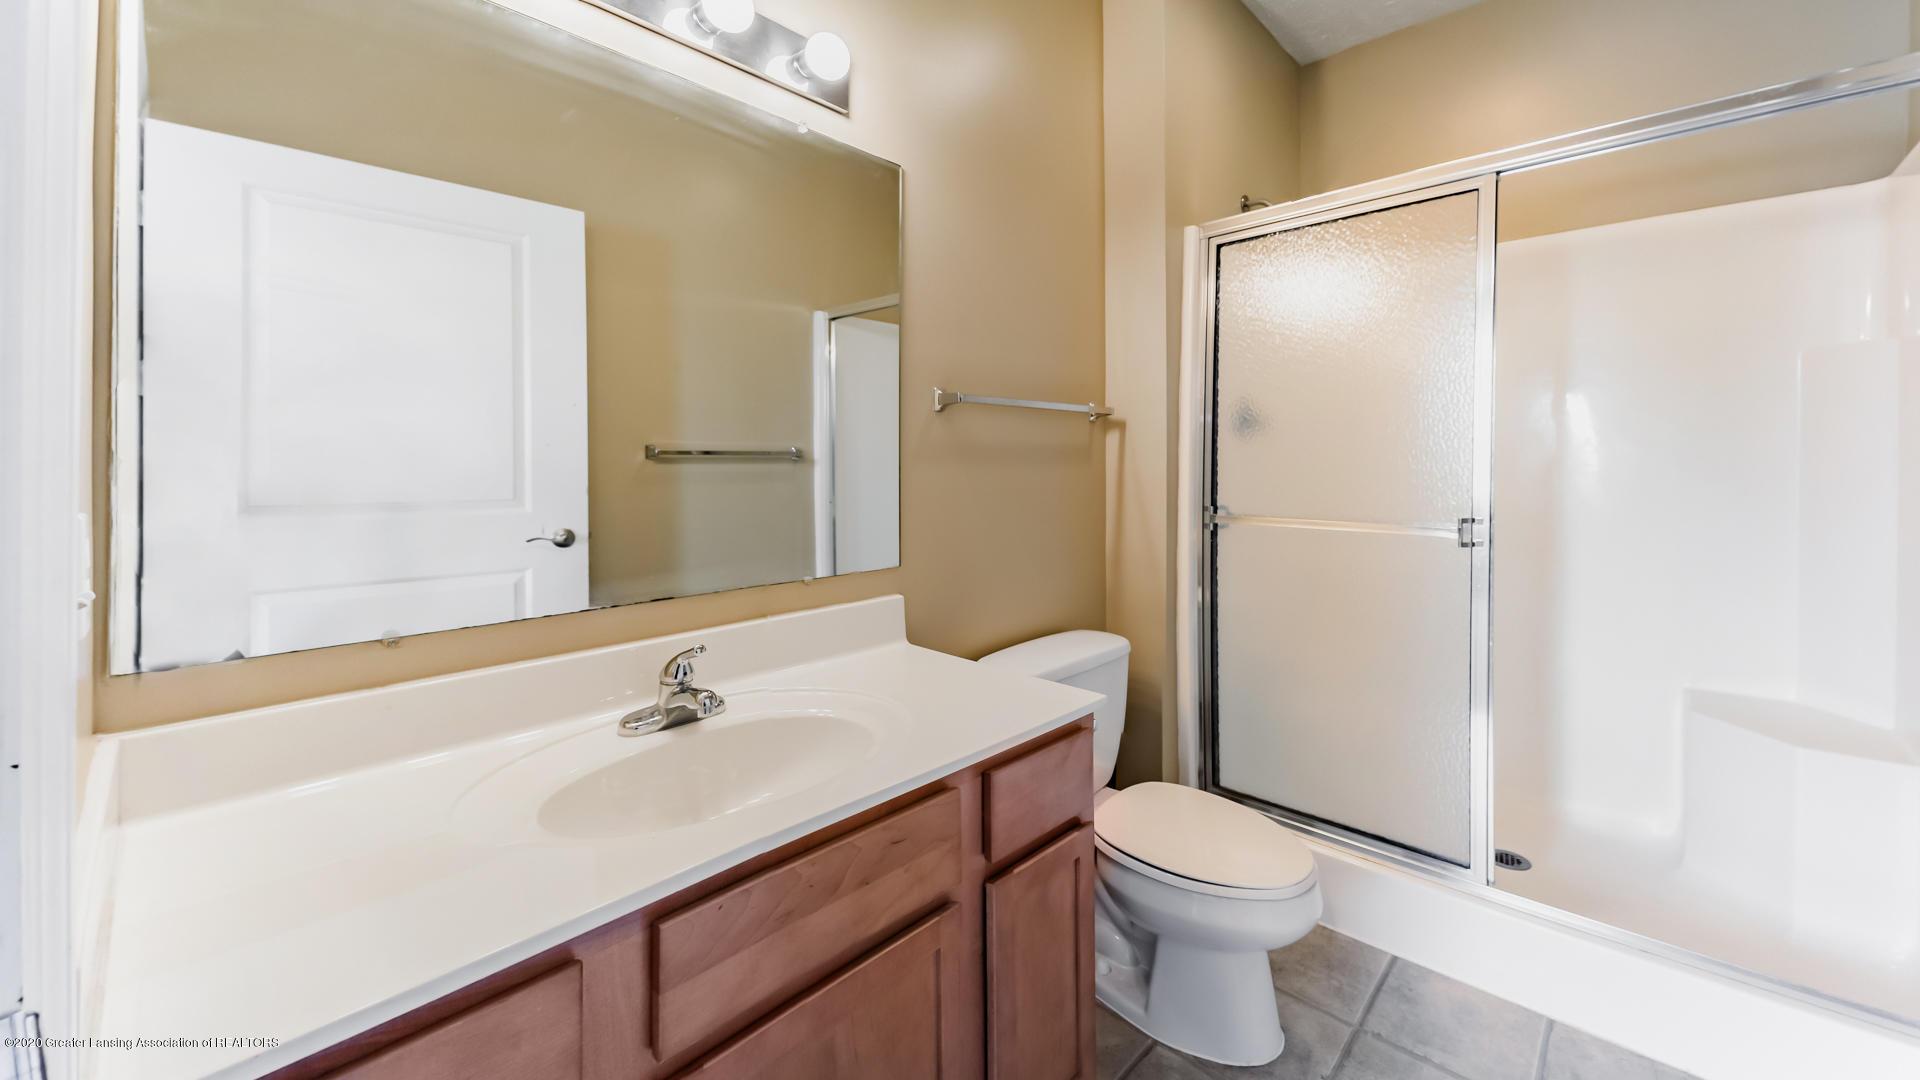 3307 Wharton St - Bathroom - 15